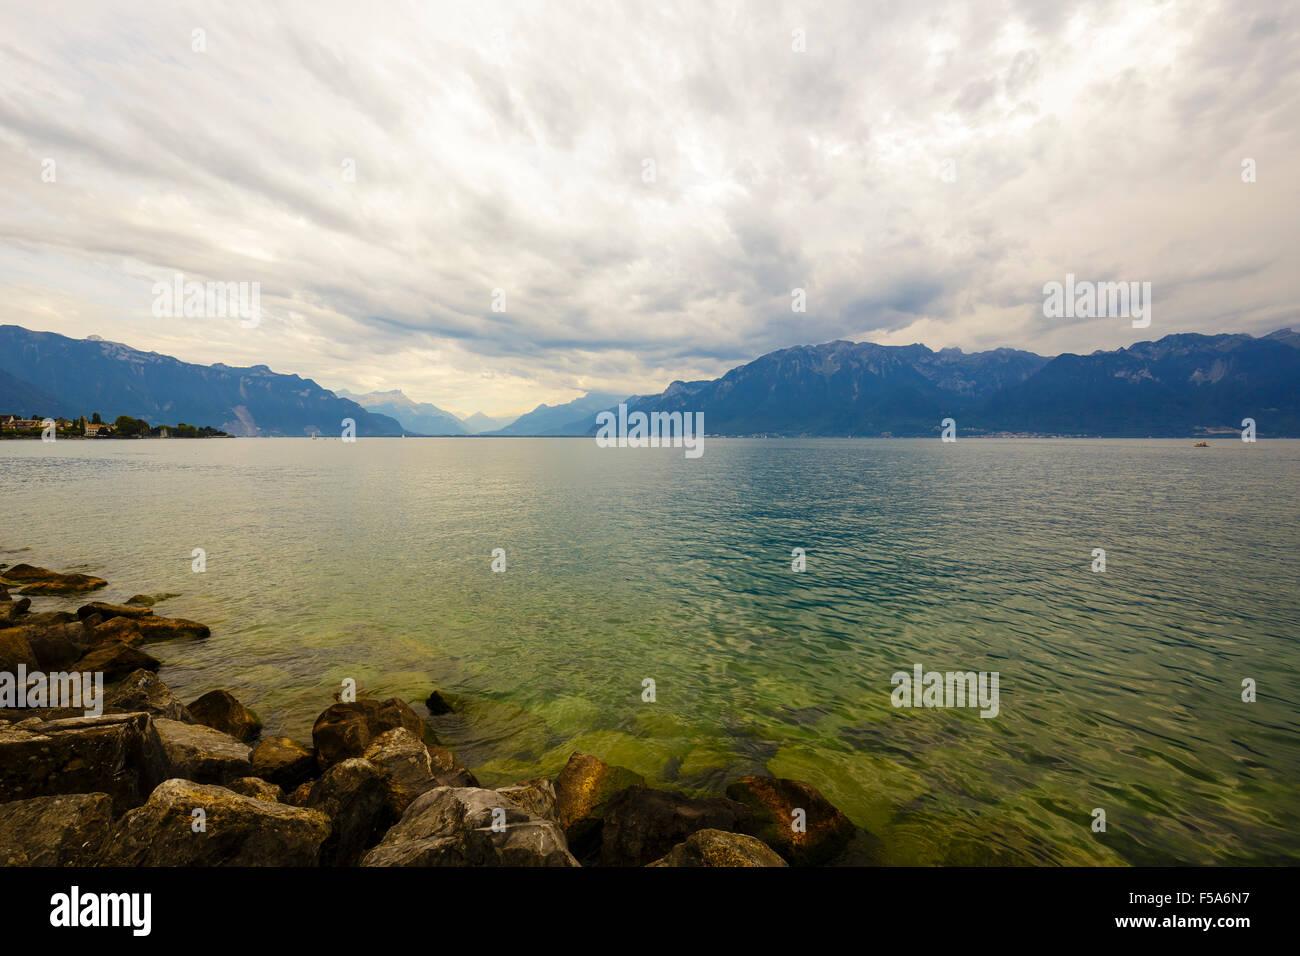 Clouds over lake Leman - Stock Image